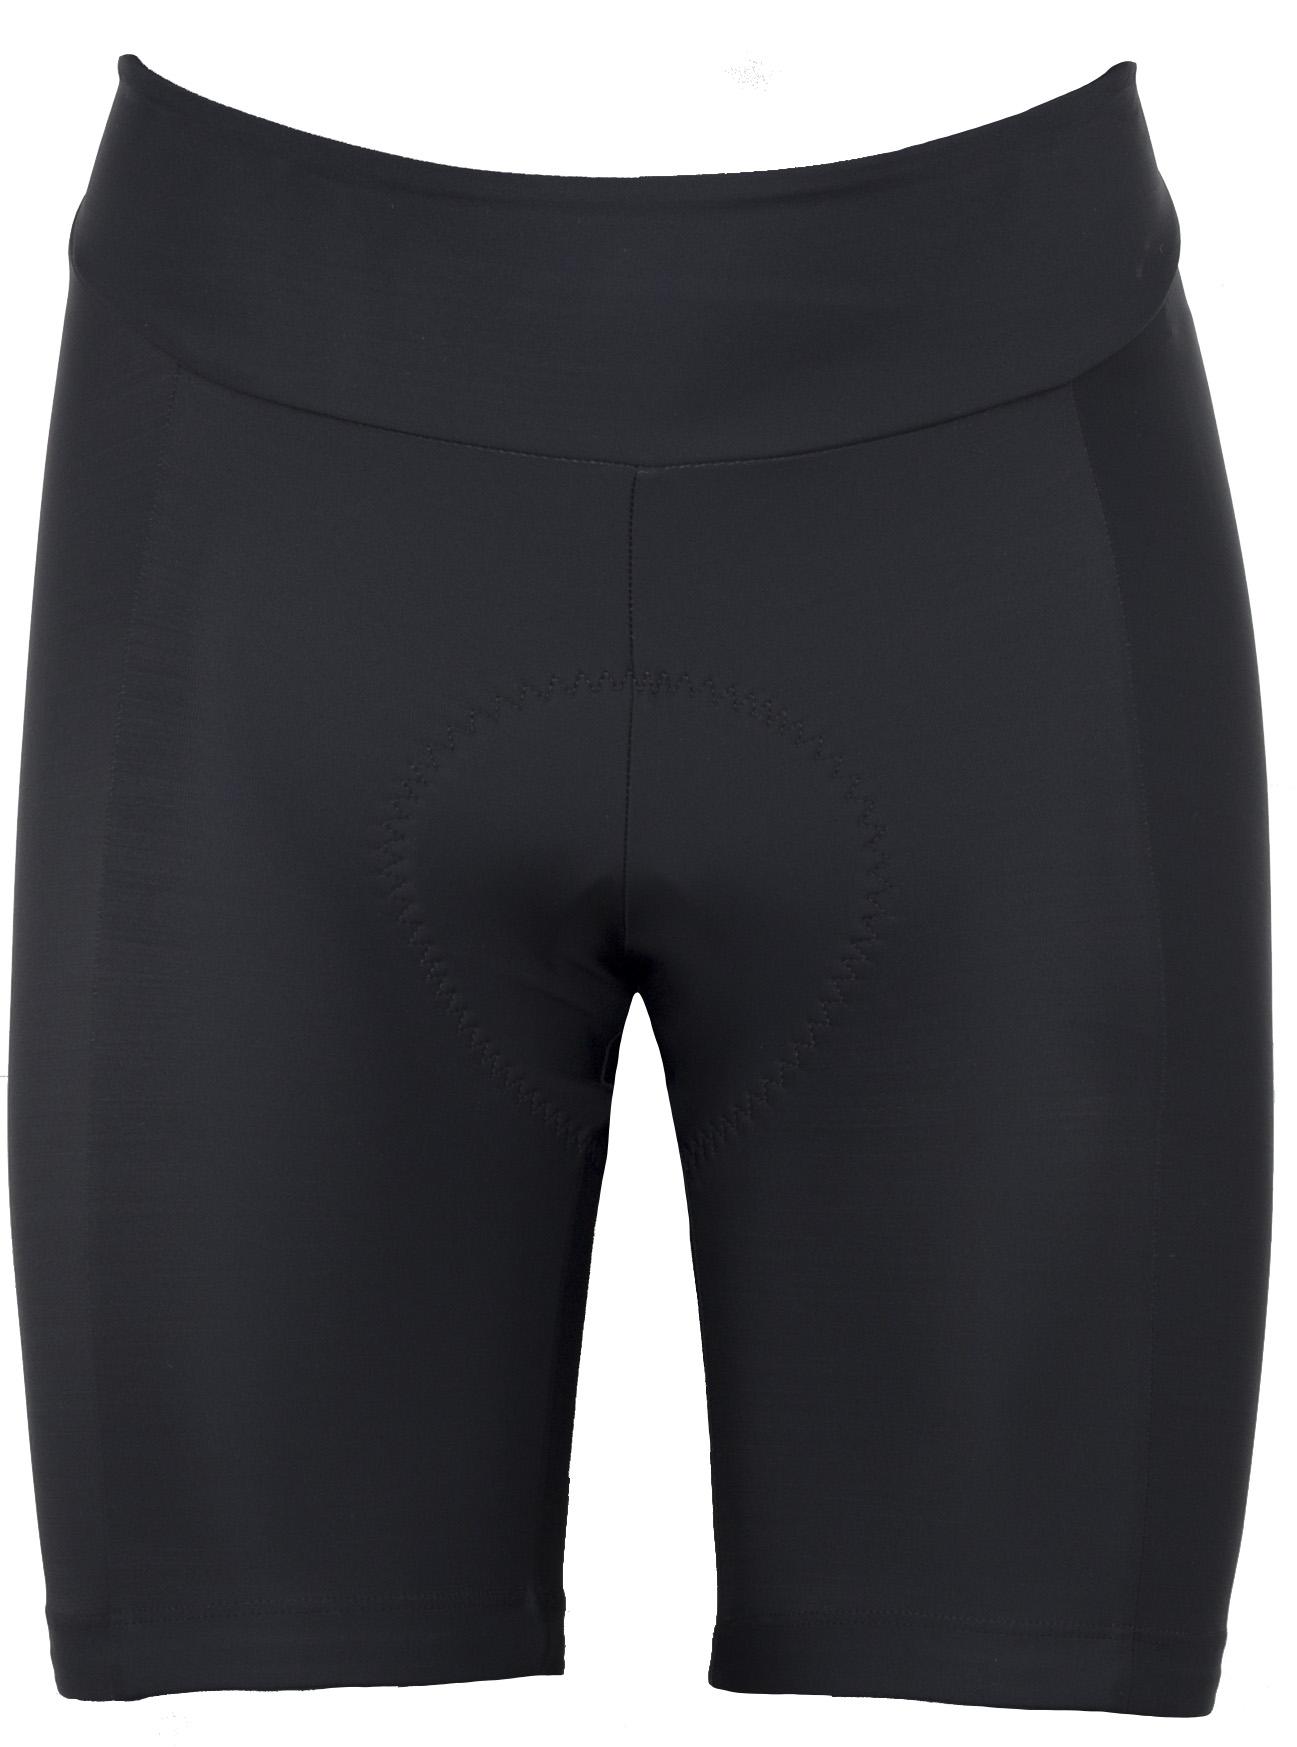 Giro | Women's Chrono Shorts | Size Small in Black